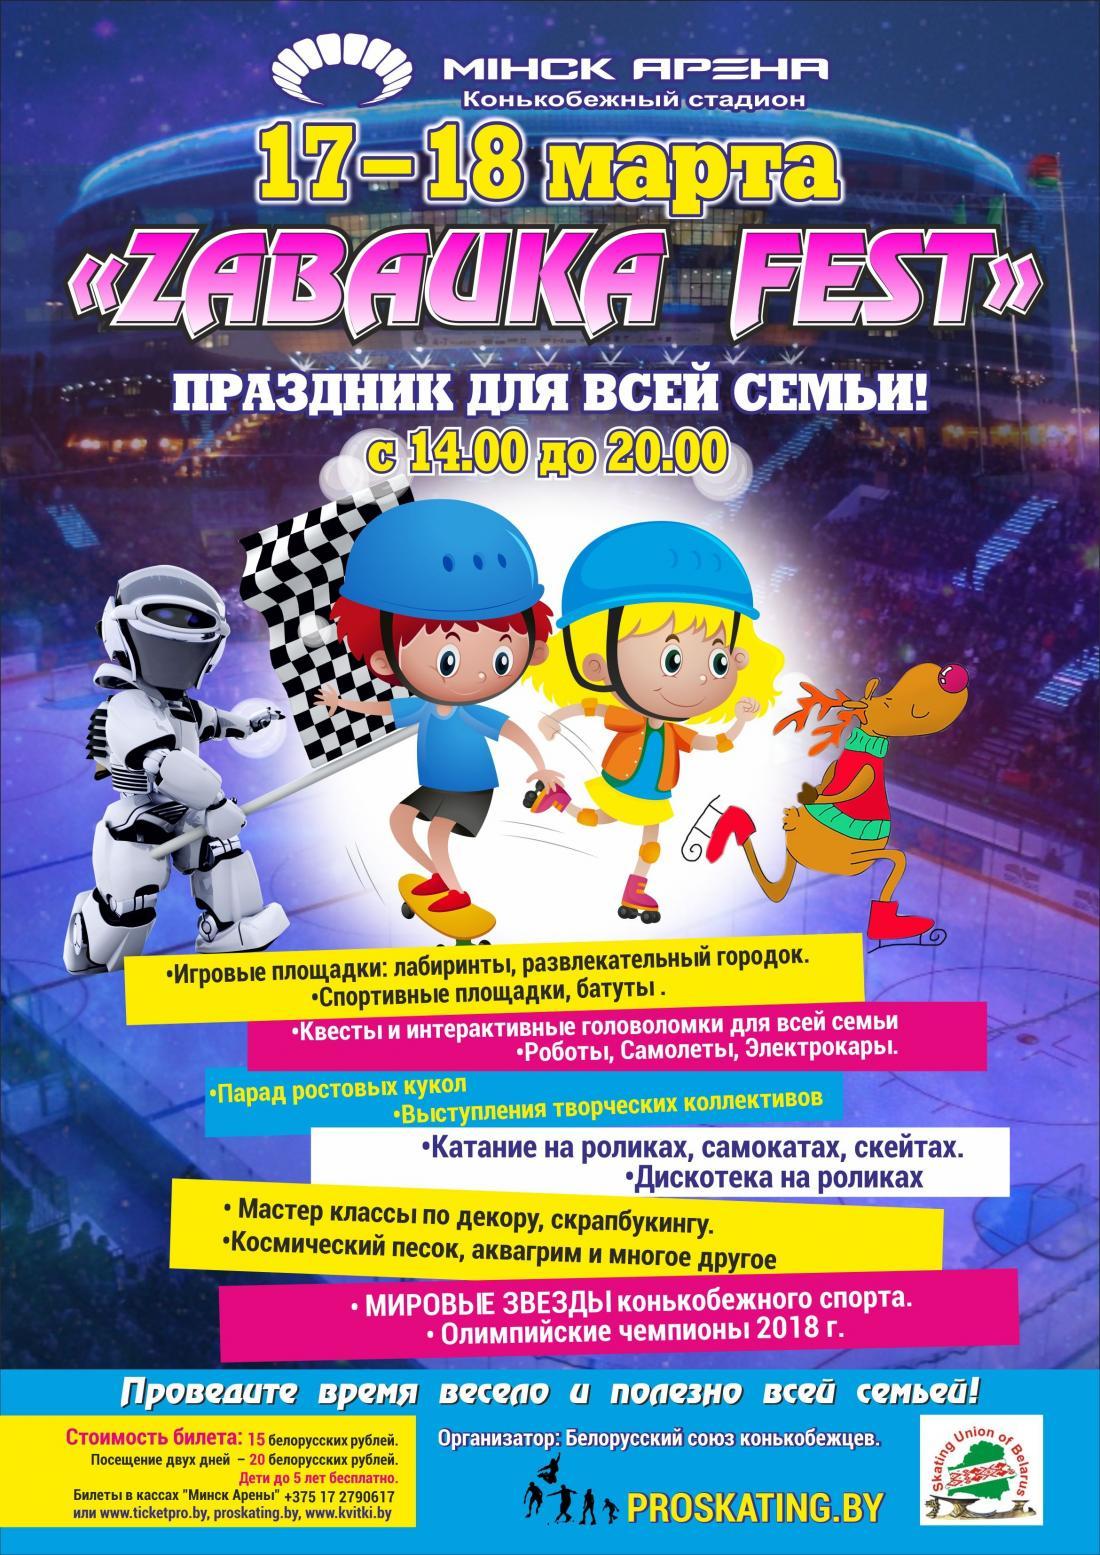 "17-18 марта фестиваль""ZabaukaFest"" + кубок мира по конькобежному спорту за 15 руб/2 дня"